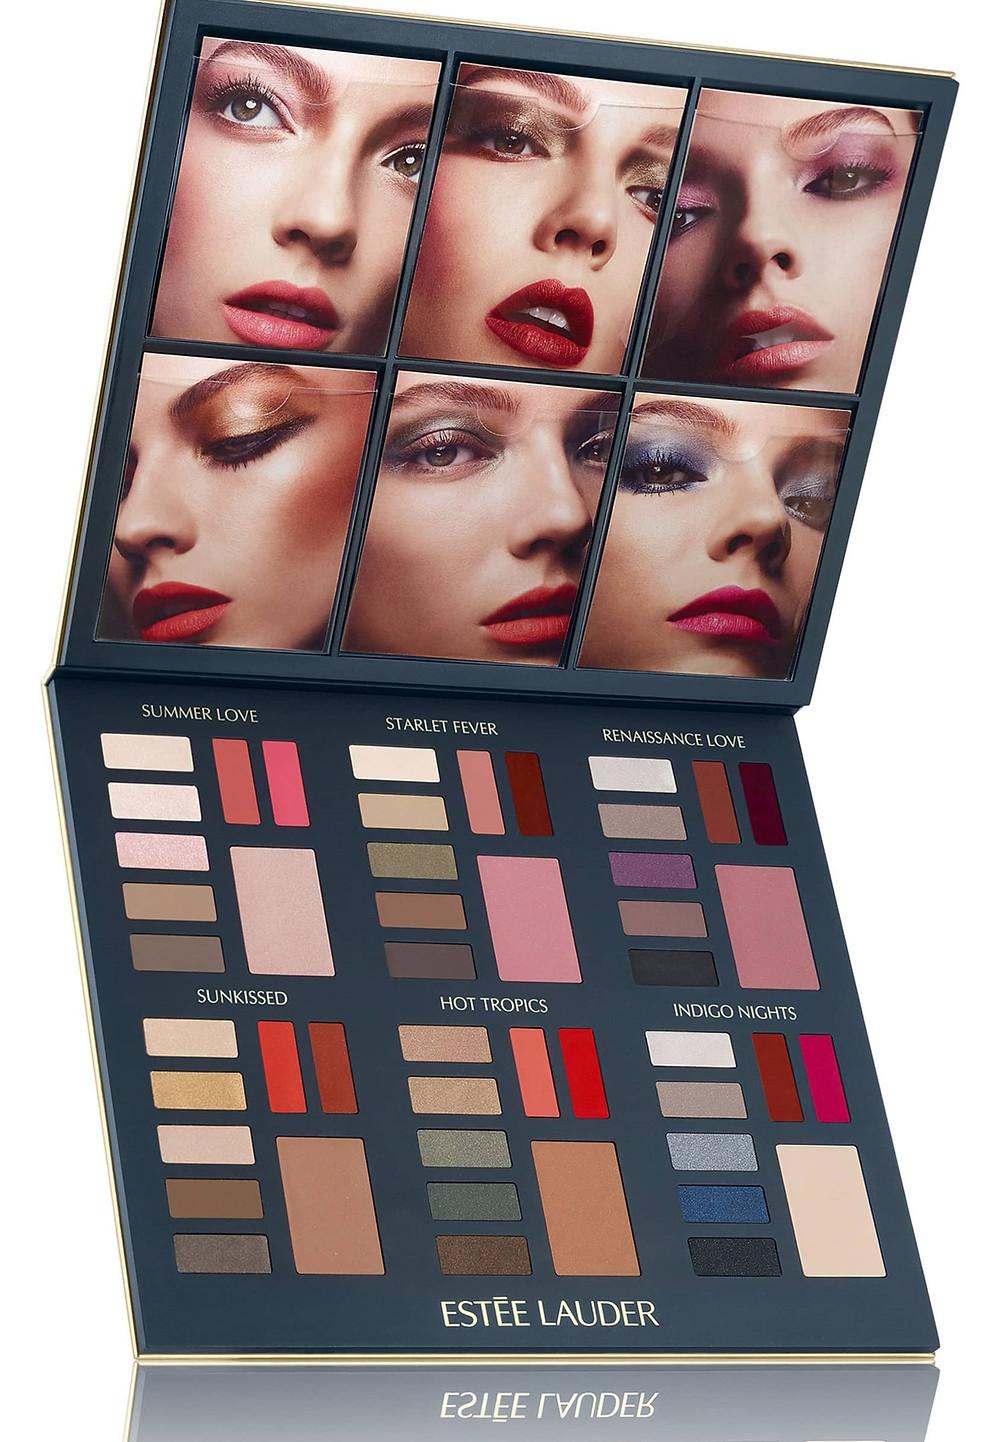 Estee Lauder Color Portfolio Collection $33.75